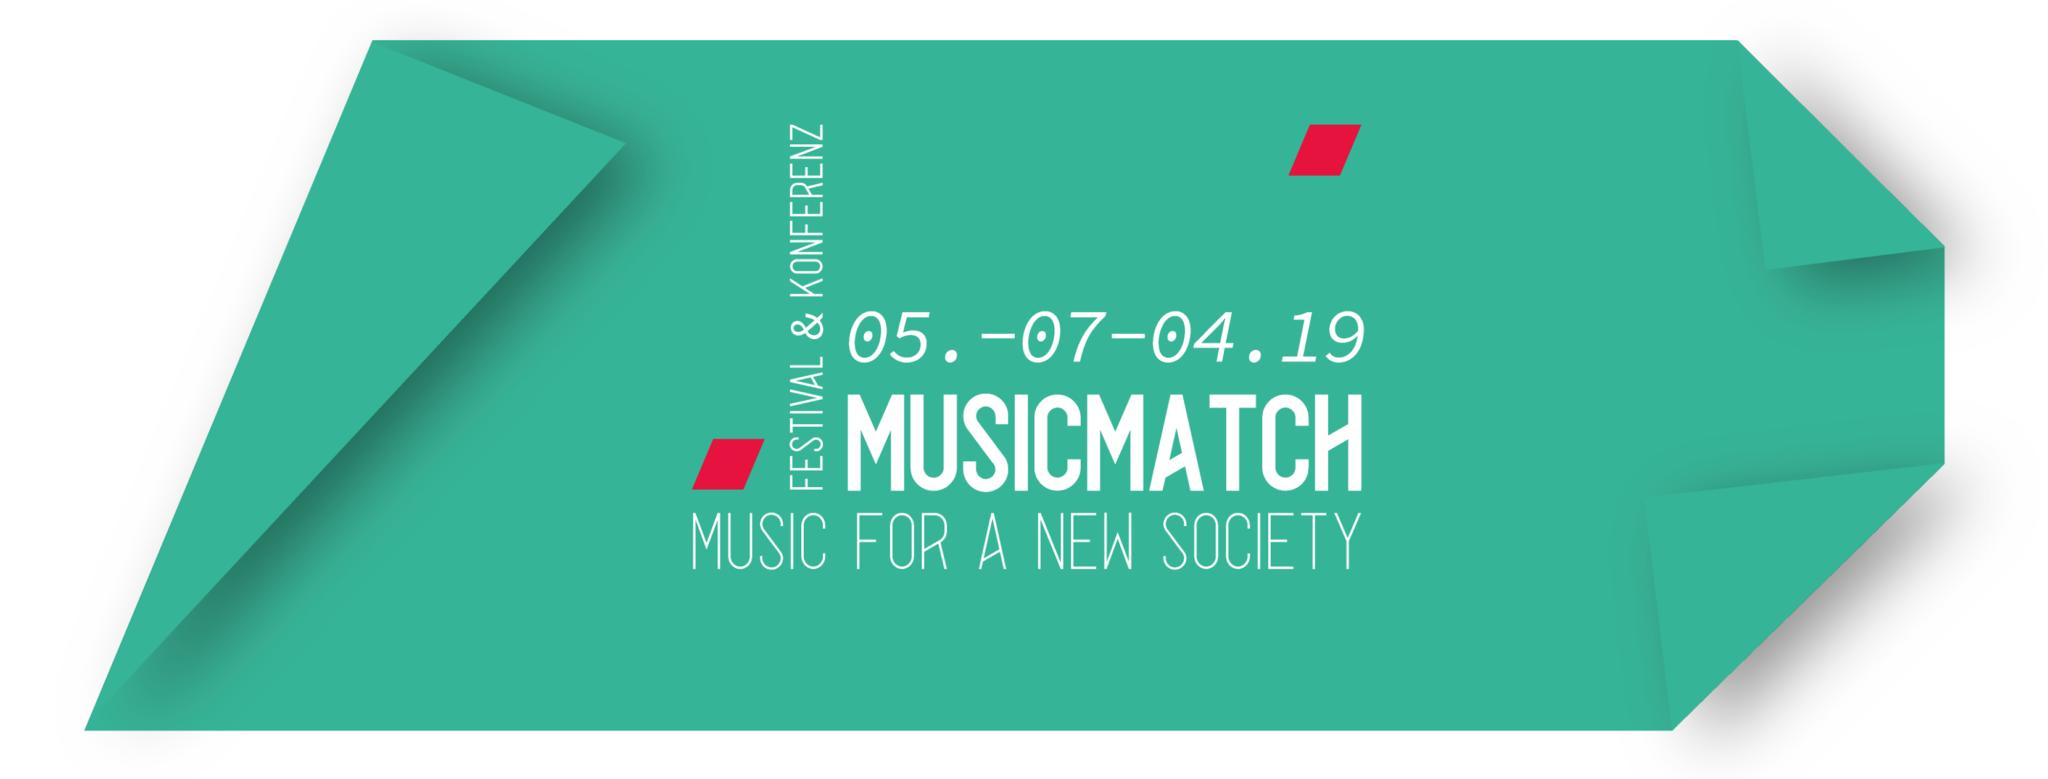 MusicMatch Festival 2019